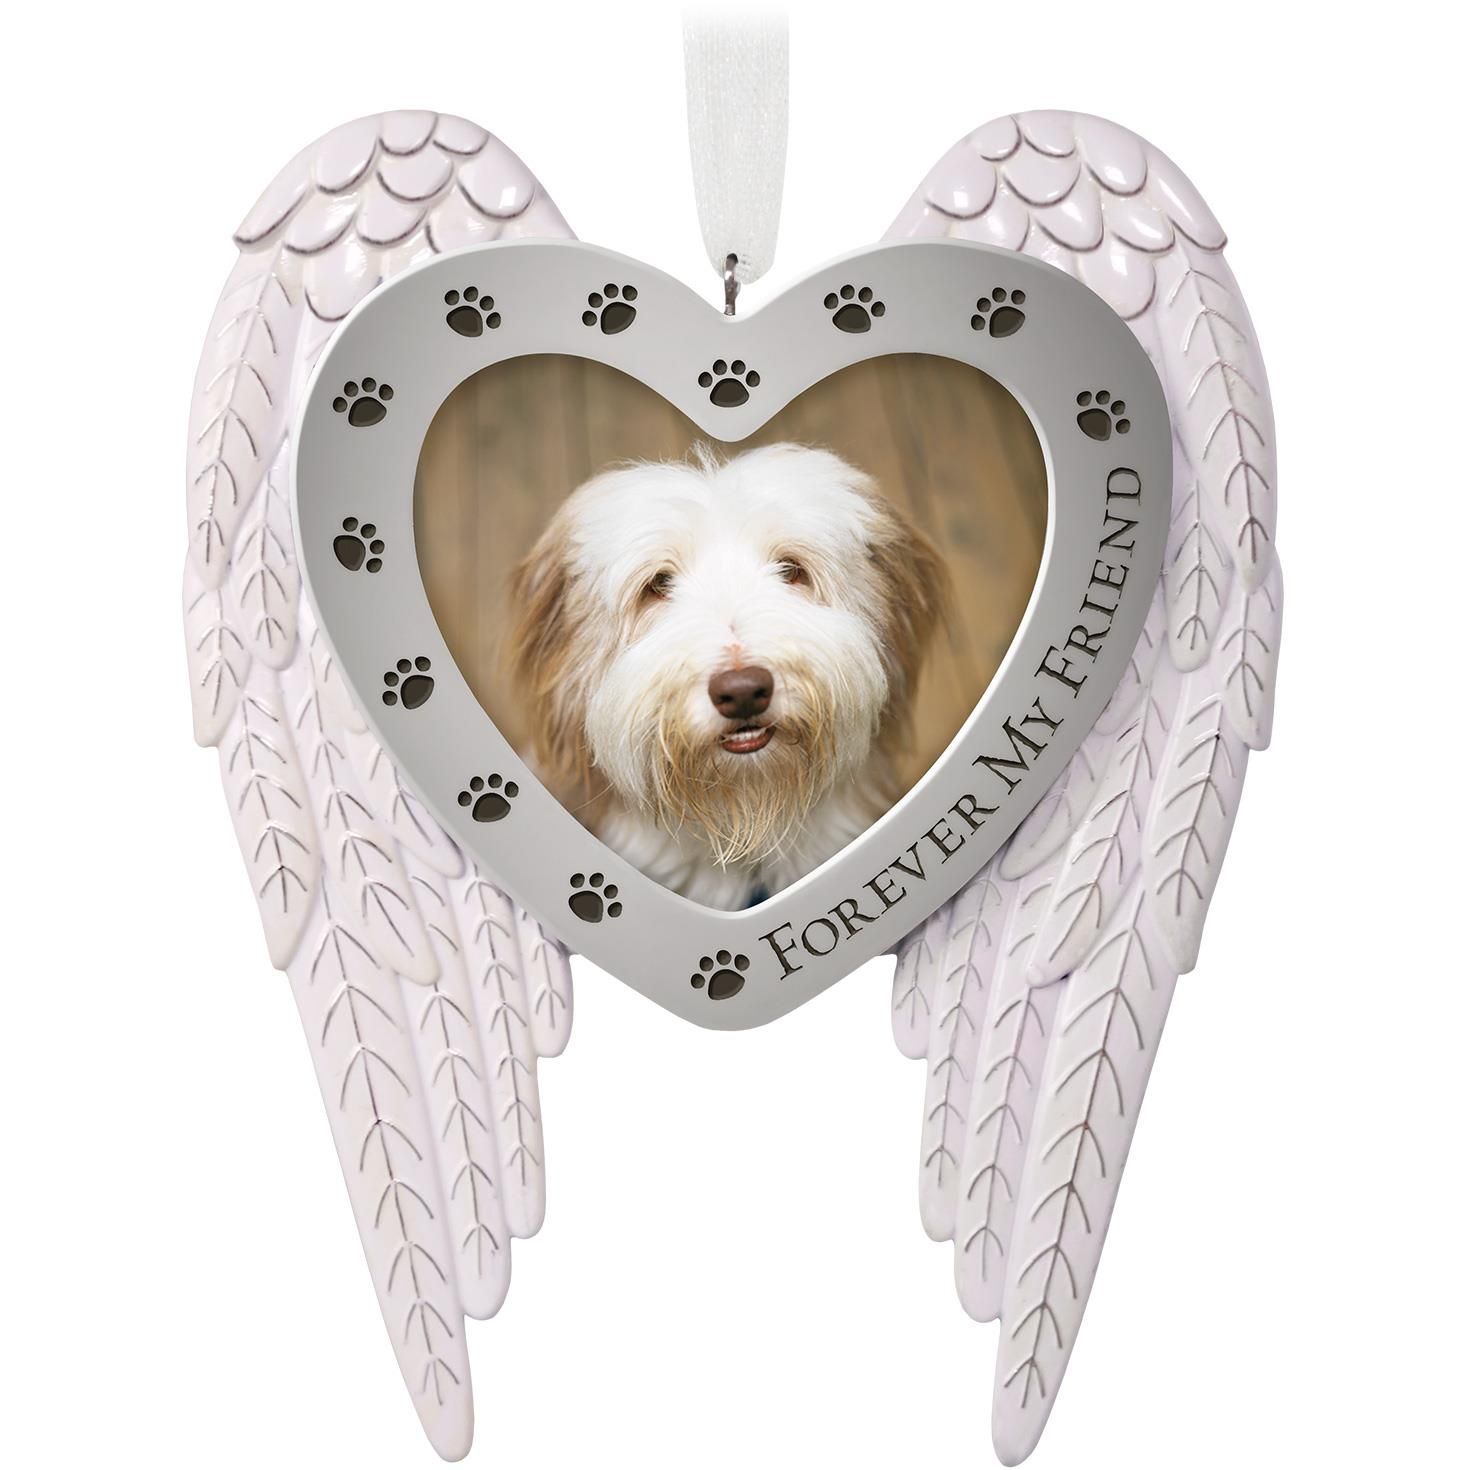 Forever My Friend Pet Memorial Metal Photo Ornament